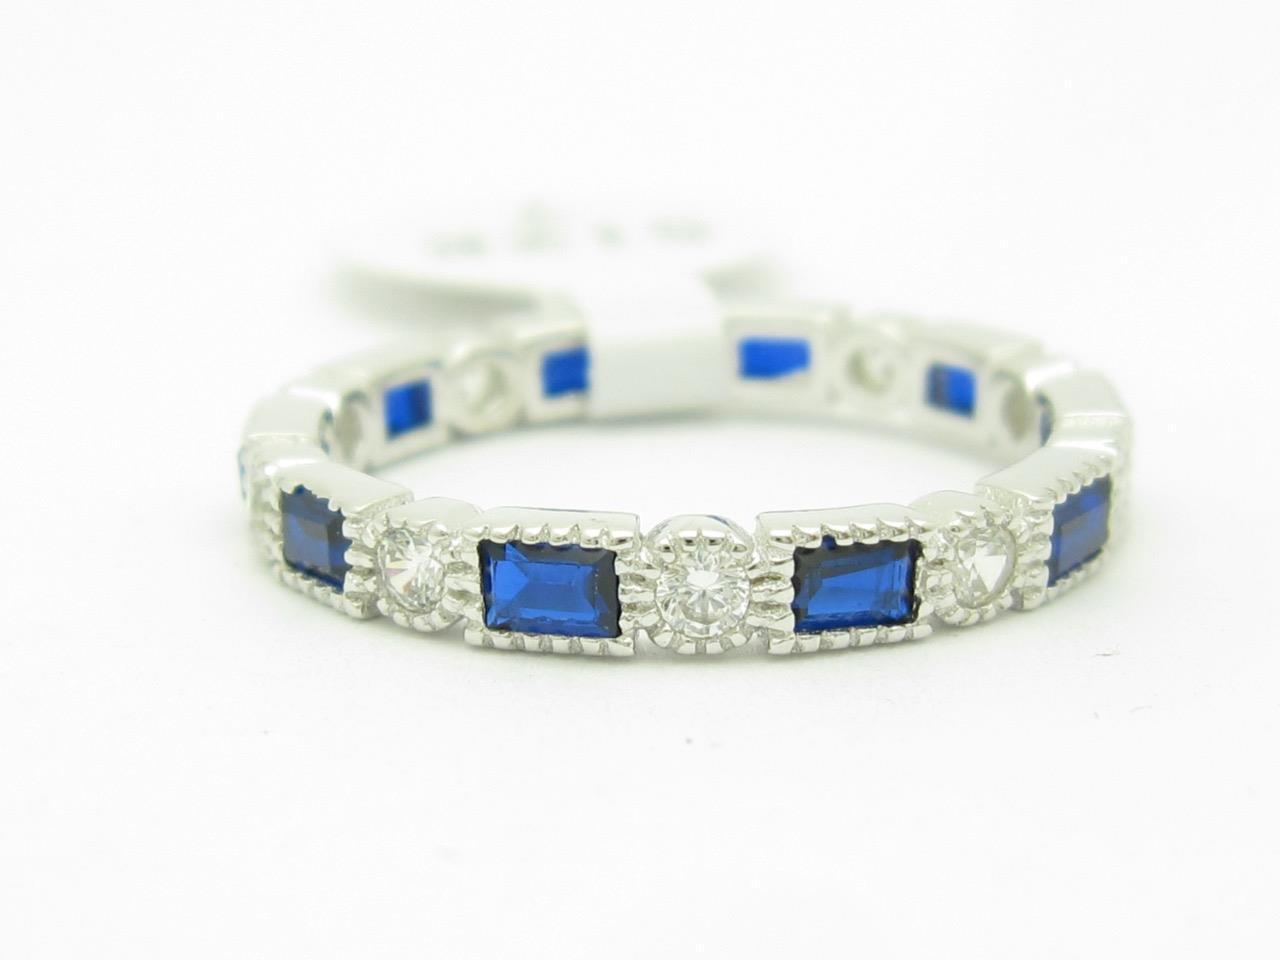 Platino argentoo argentoo argentoo Blu & Bianco Zaffiro Sottile 695241